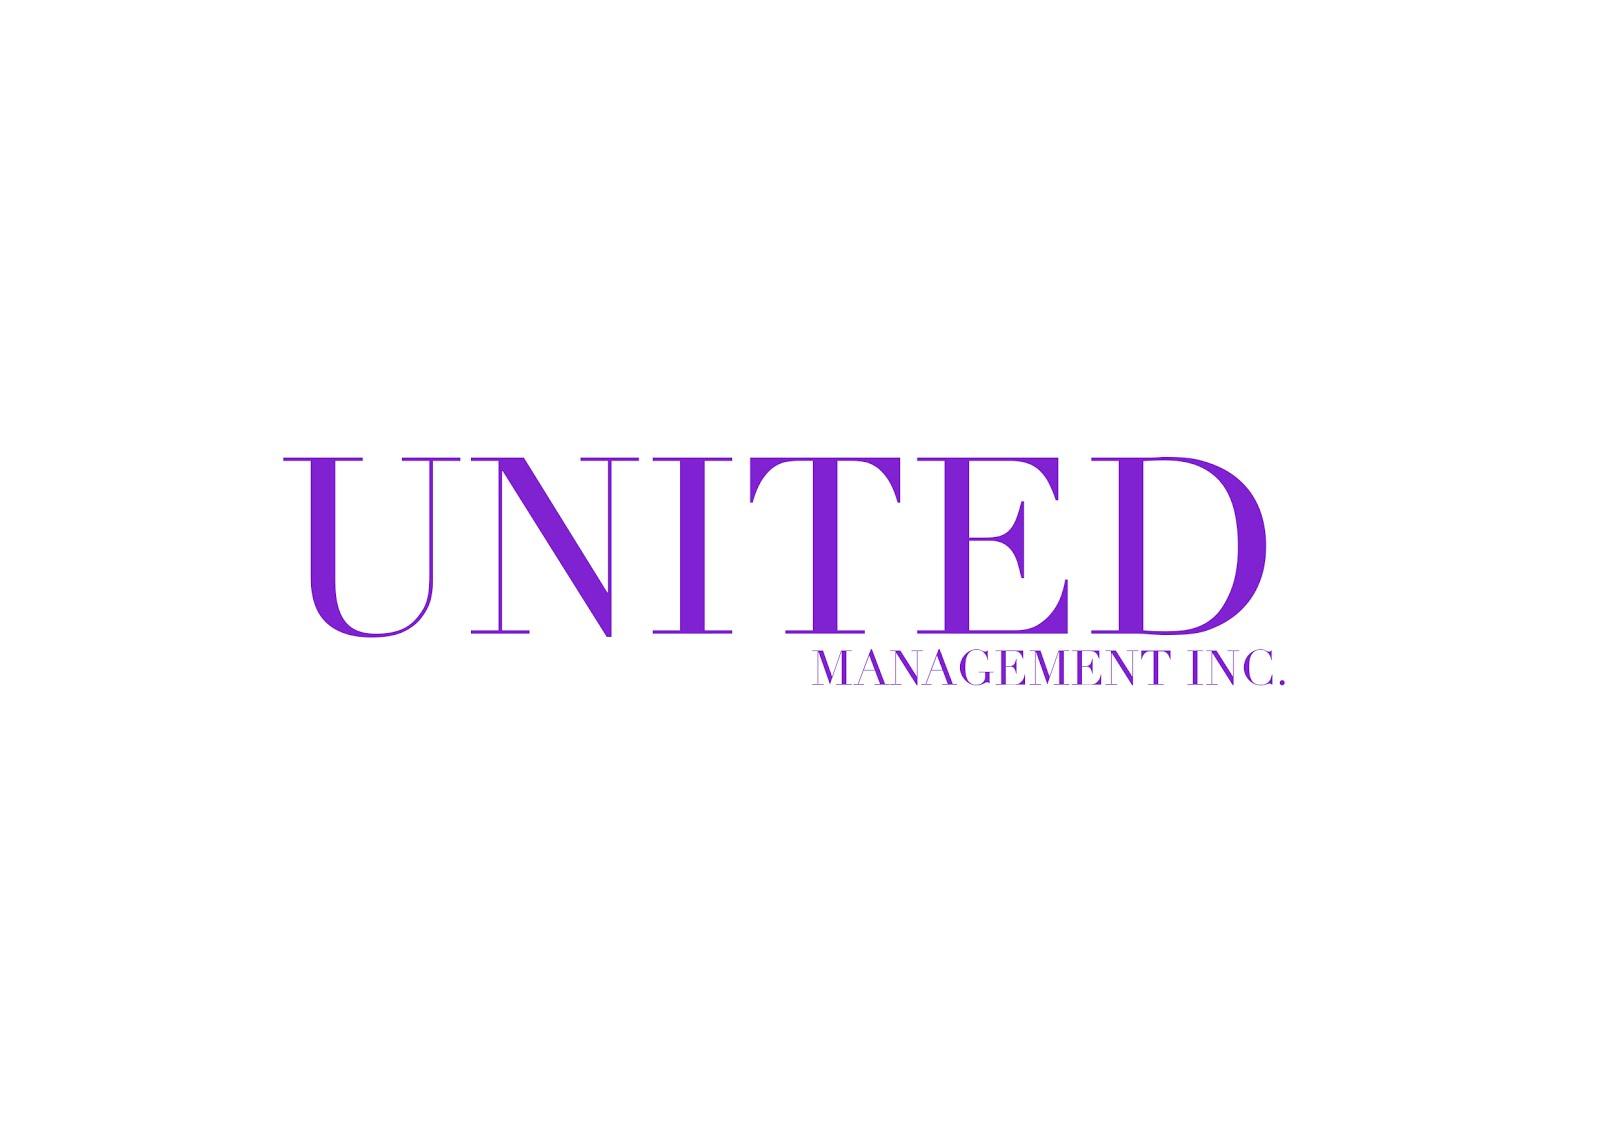 United Management Inc